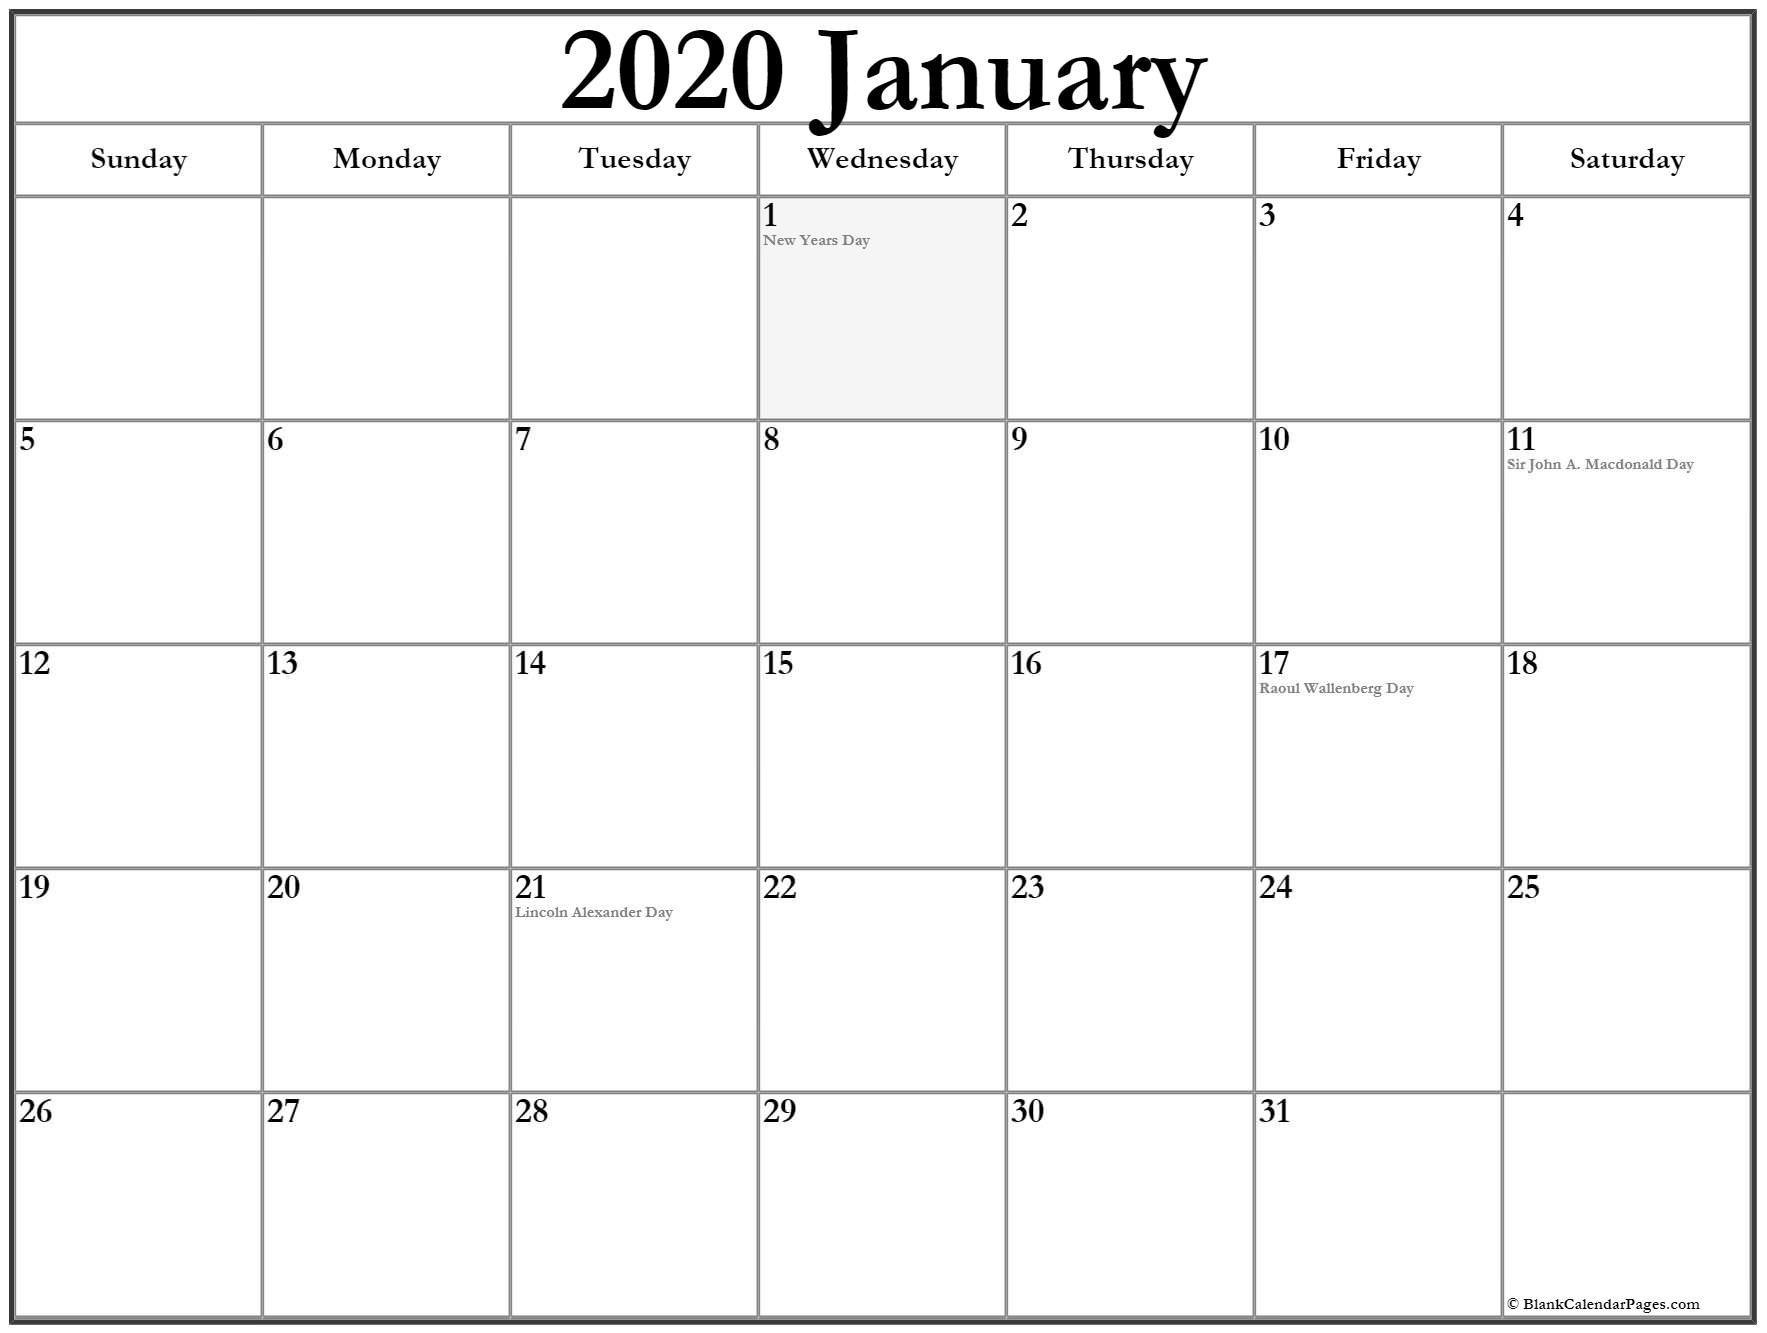 January 2020 Calendar With Holidays | Canadian Calendar Printable Calendar 2020 Of Ridiculous Holidays